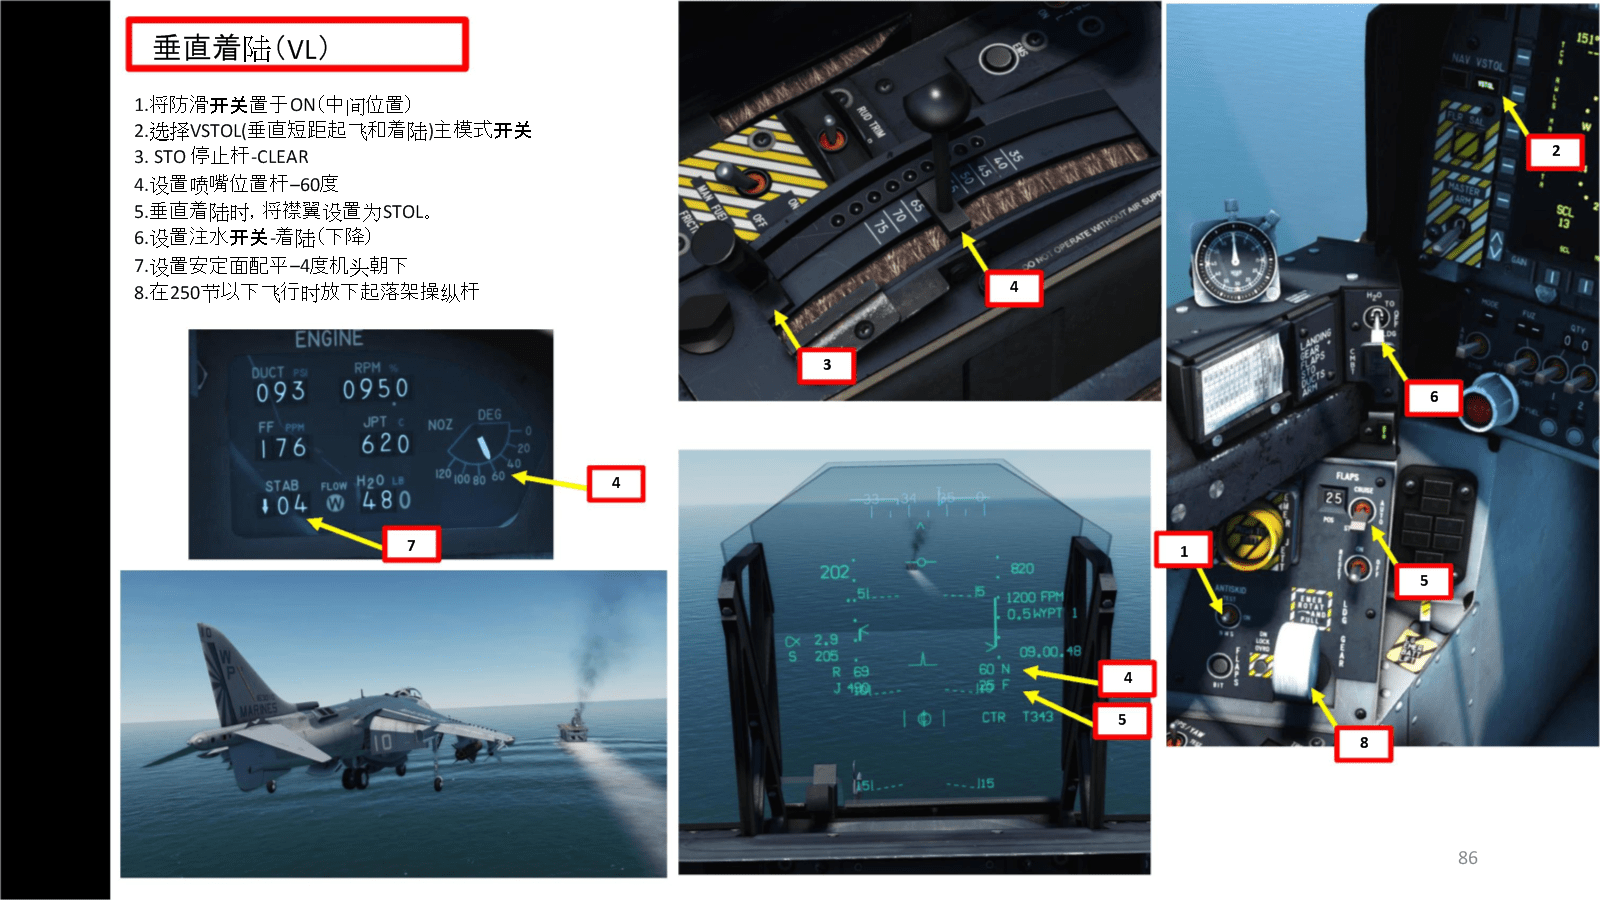 DCS AV 8B Harrier2鹞2垂直起降战斗机 中文指南 6.2着陆.docx